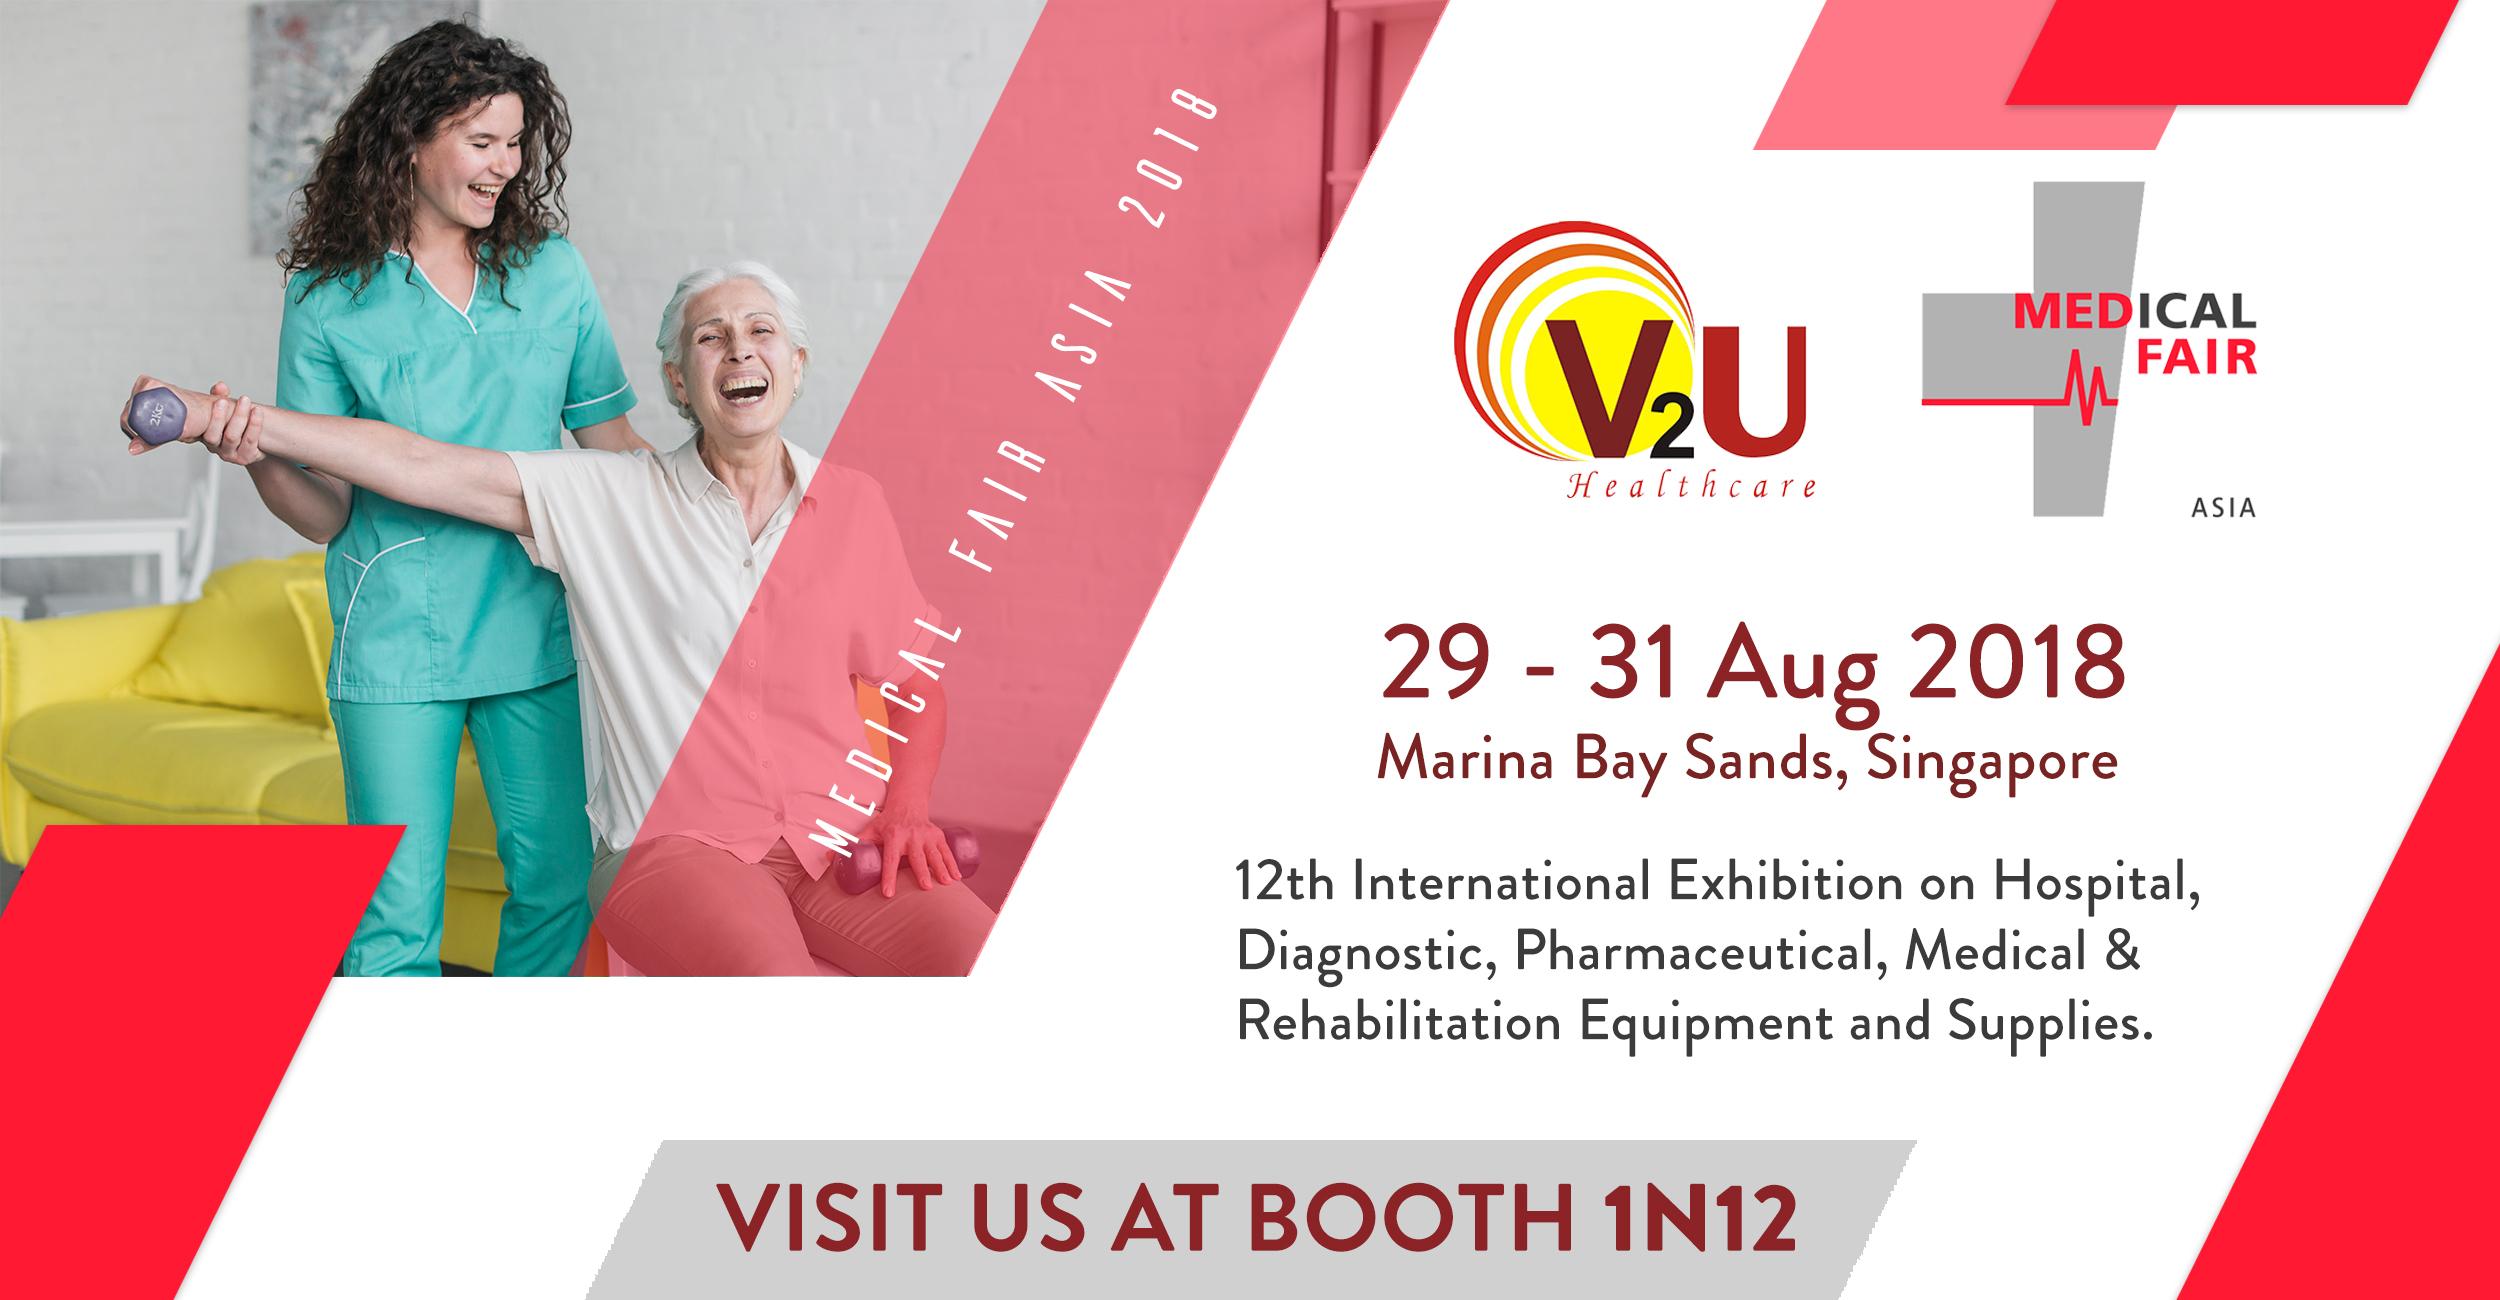 Medical Fair Asia - Singapore, 2018